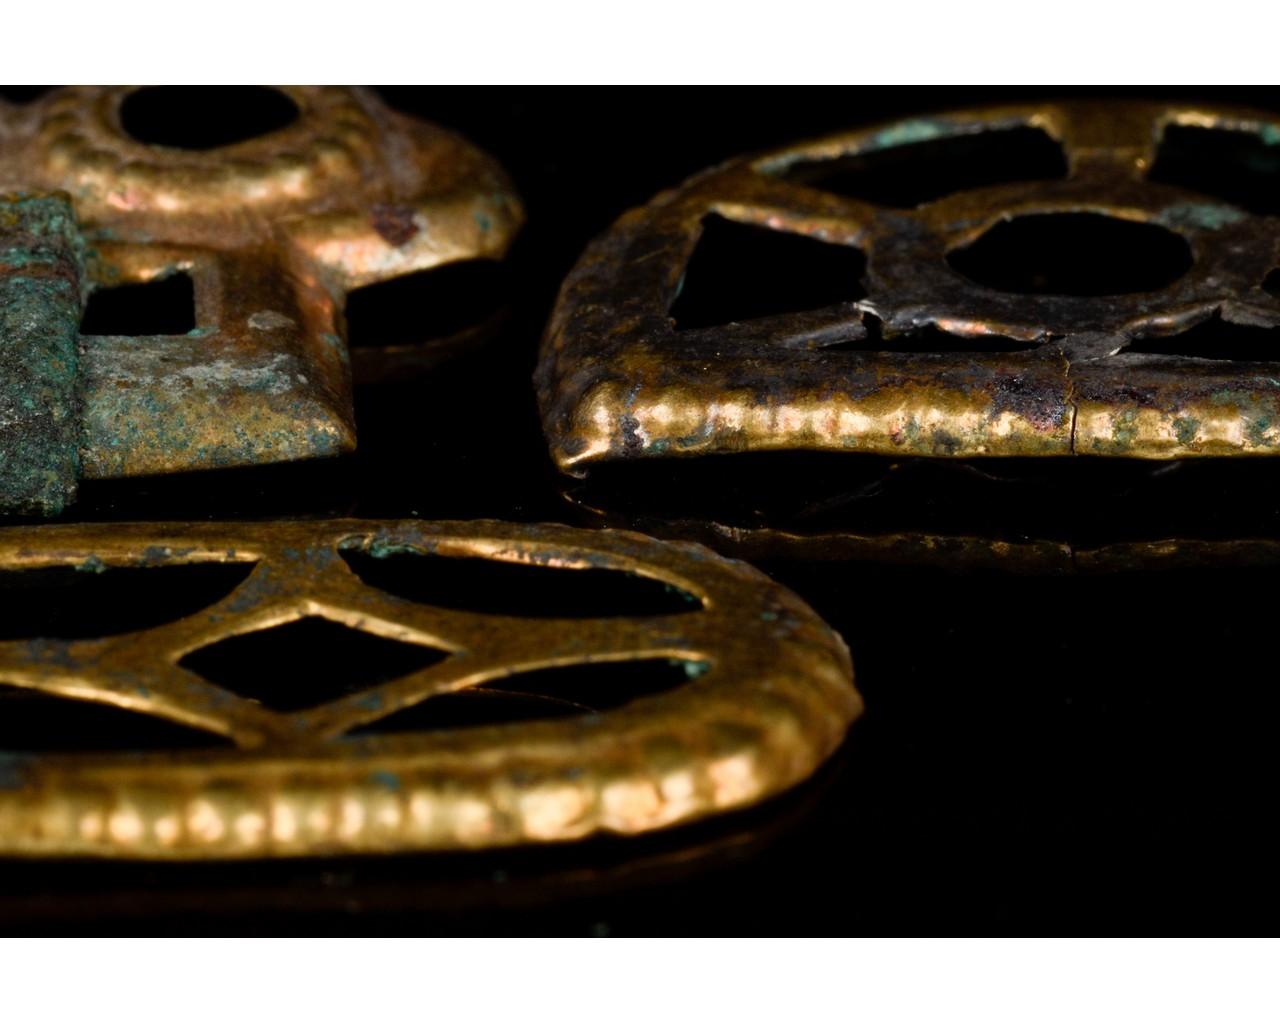 MEROVINGIAN GILDED BRONZE BELT FITTINGS SET - Image 4 of 8